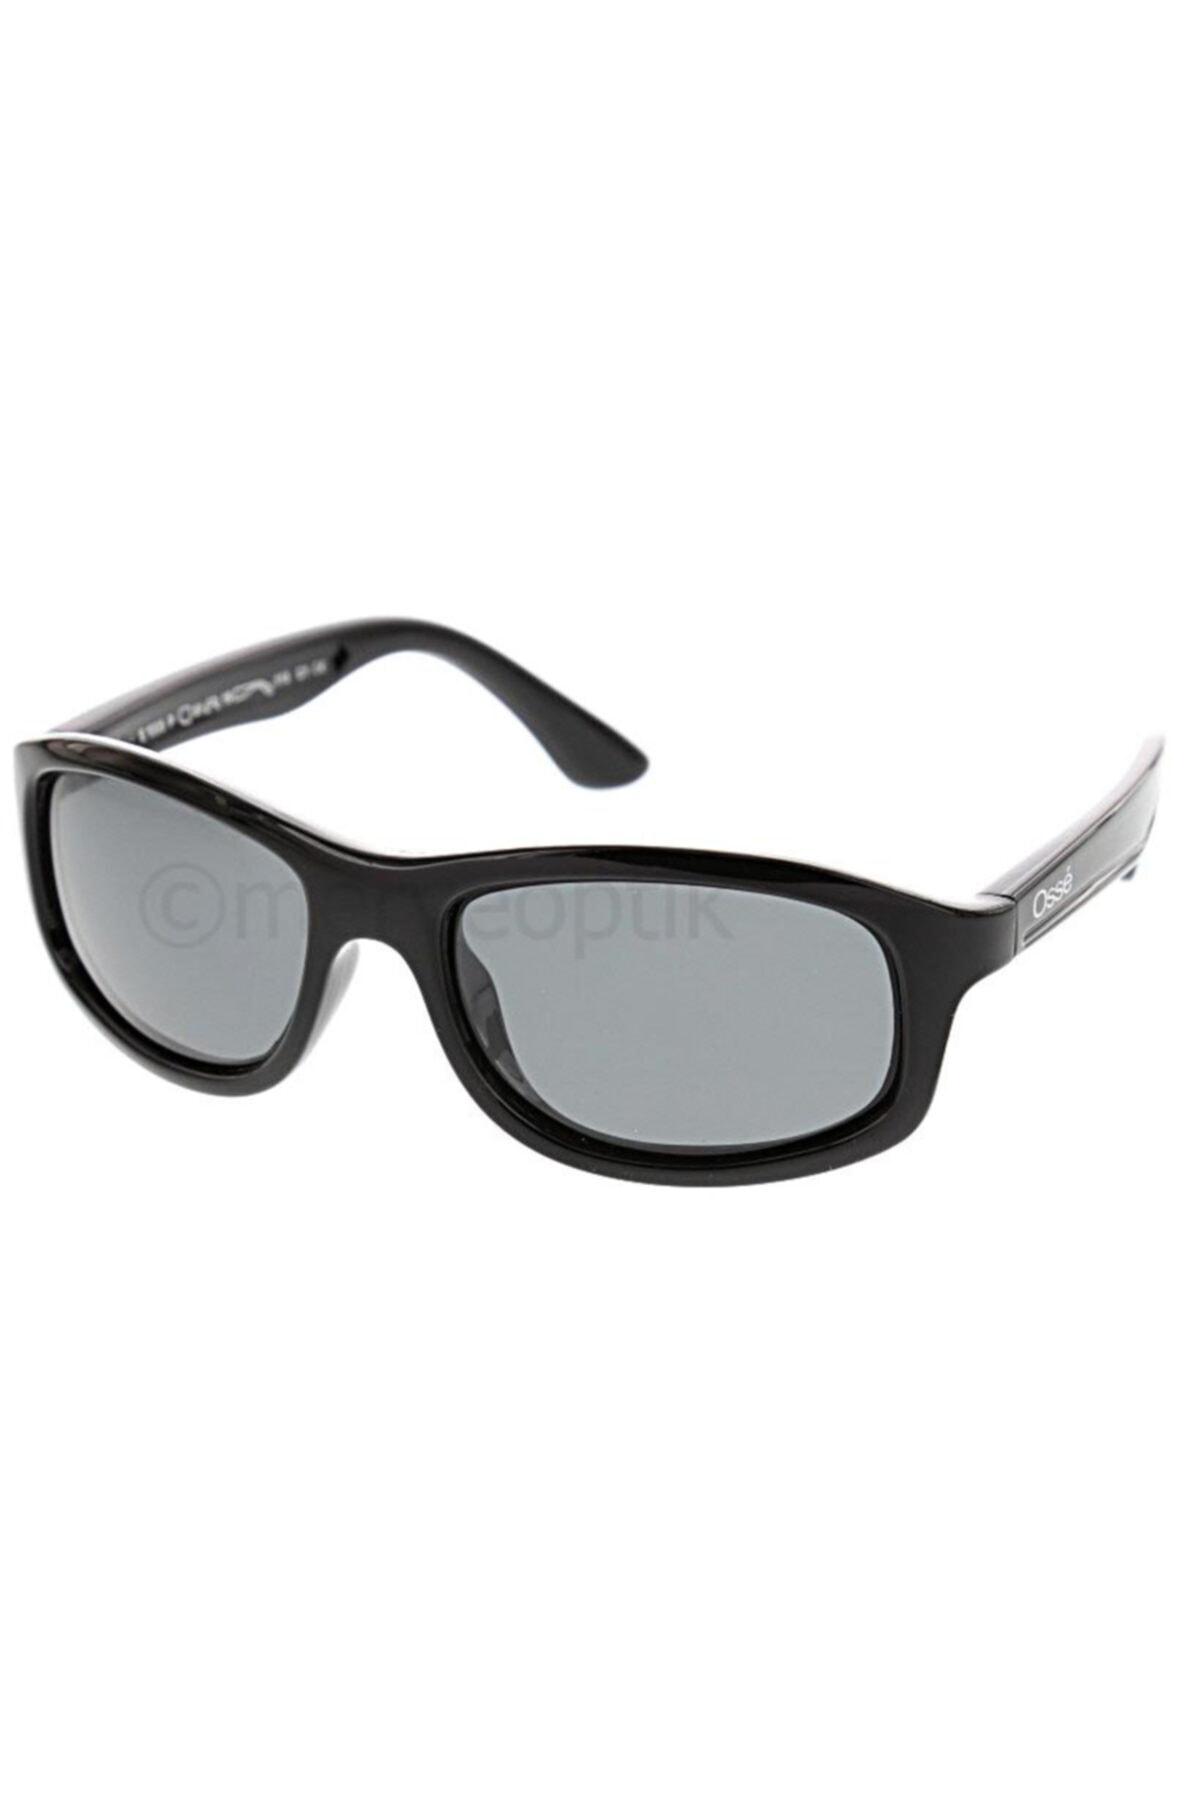 مدل عینک آفتابی 2021 برند Osse رنگ مشکی کد ty32180288